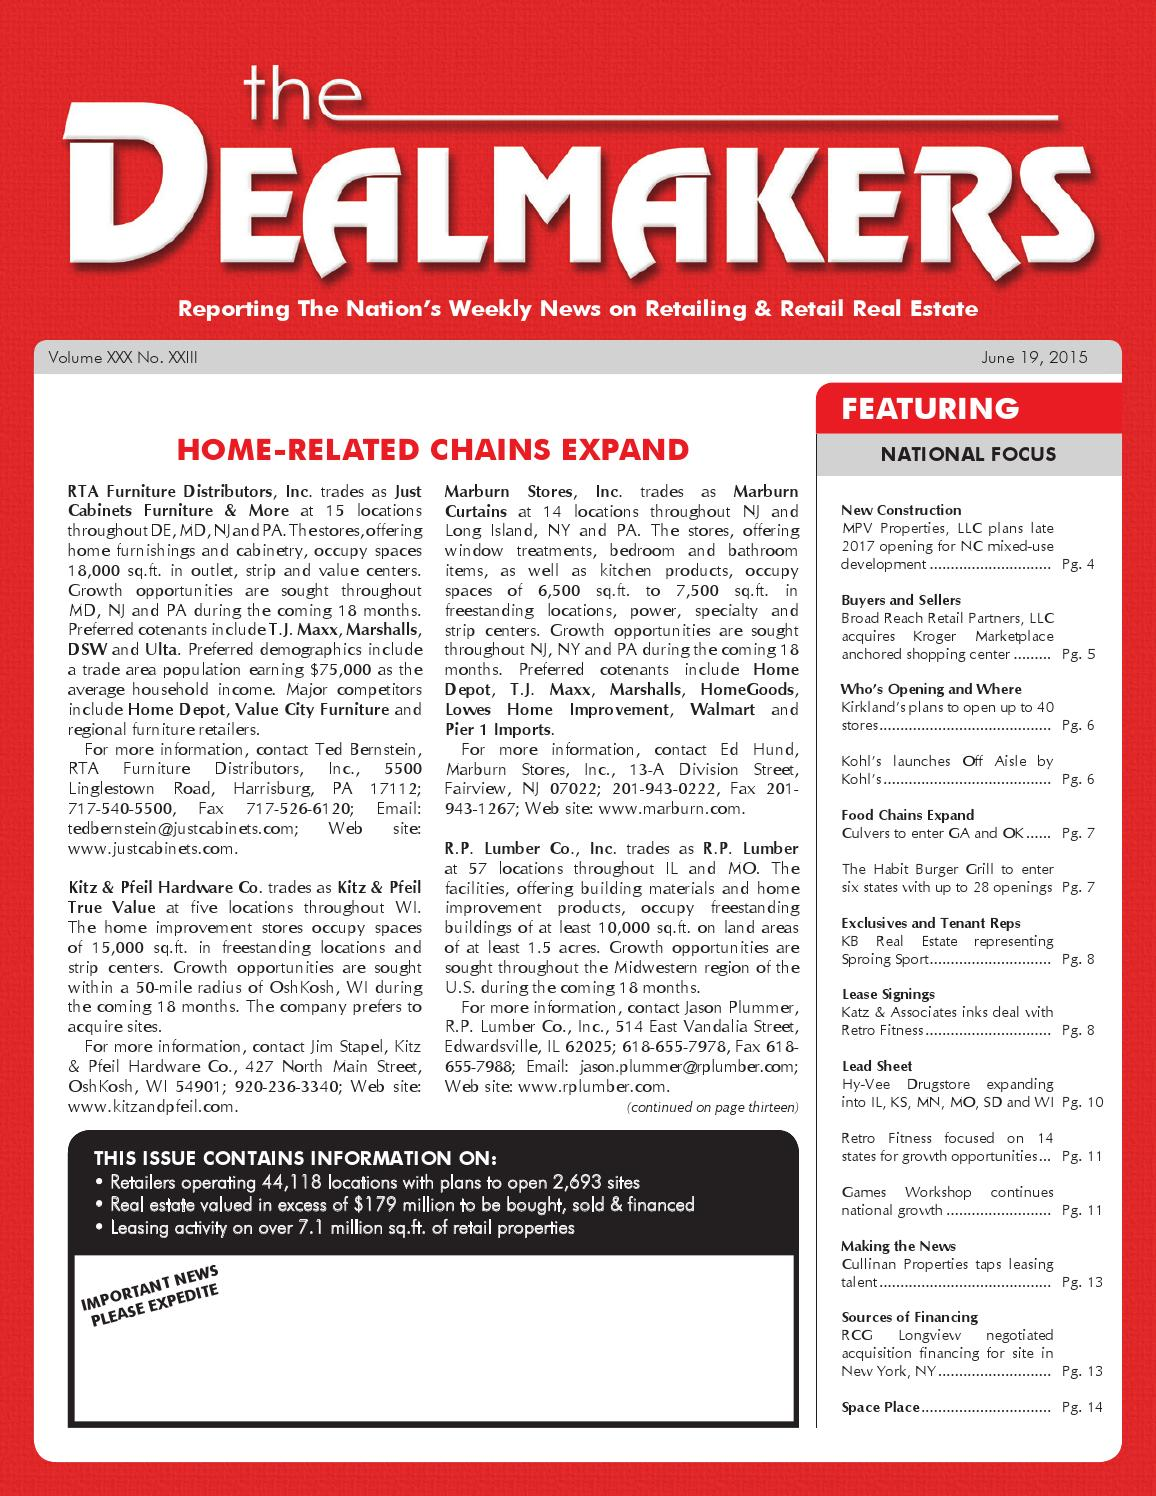 Dealmakers Magazine